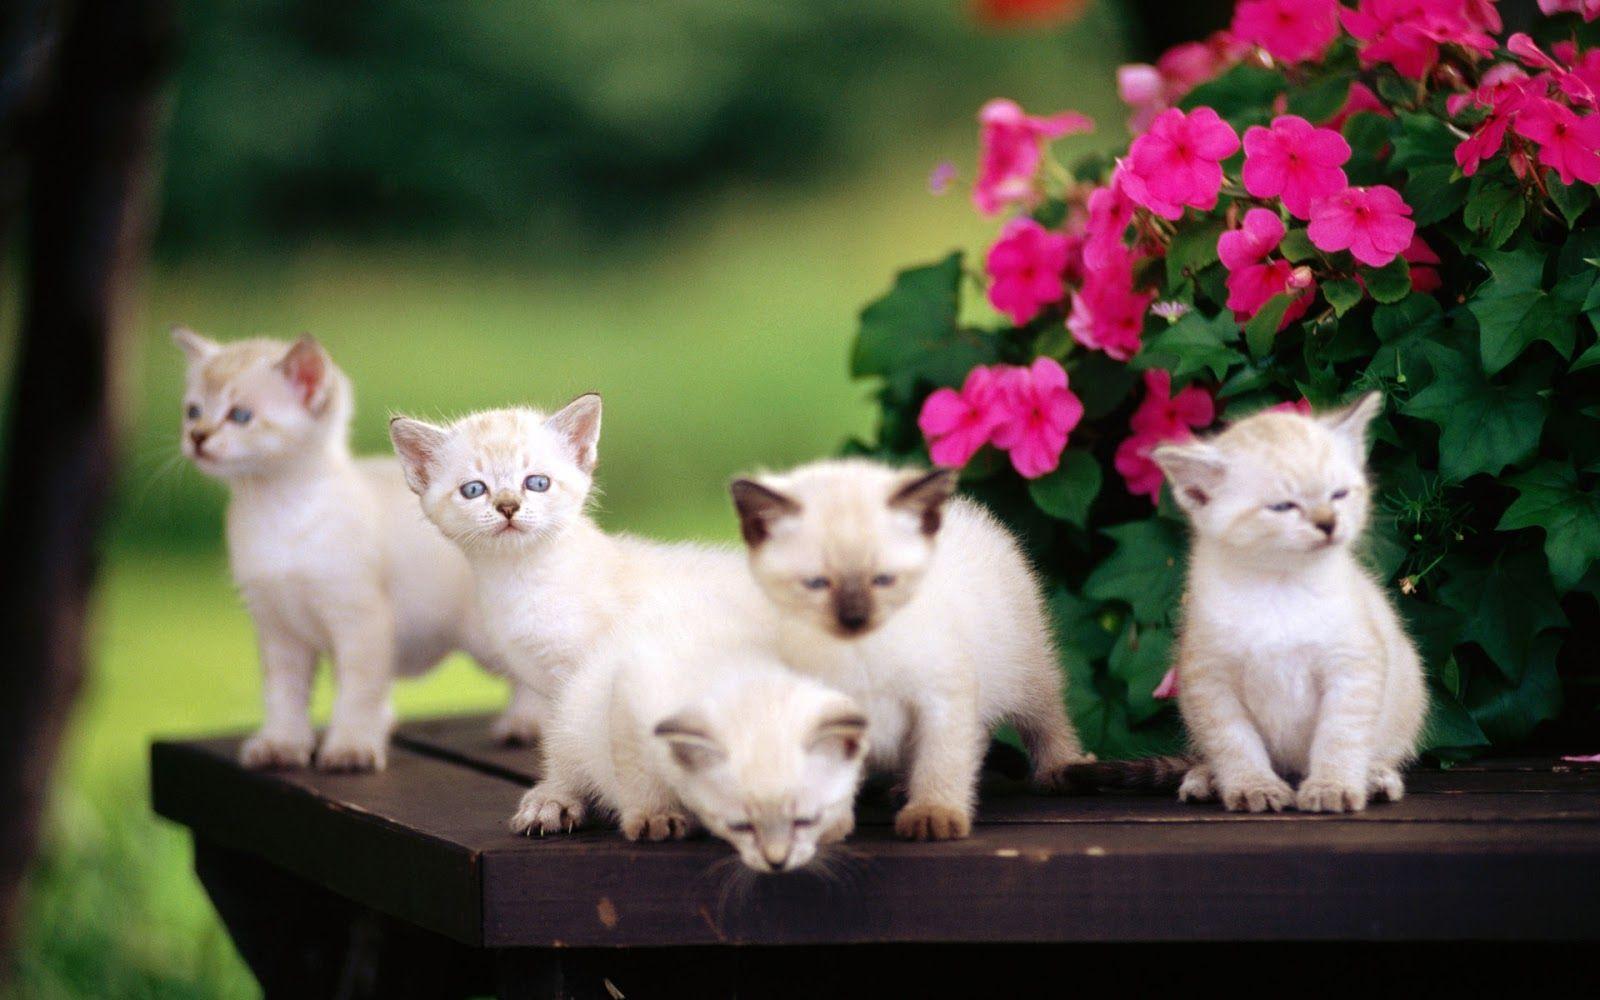 Wallpaper download cat - Hd Free Cat Wallpapers Hd Images New 1595 1075 Cute Cat Wallpapers 49 Wallpapers